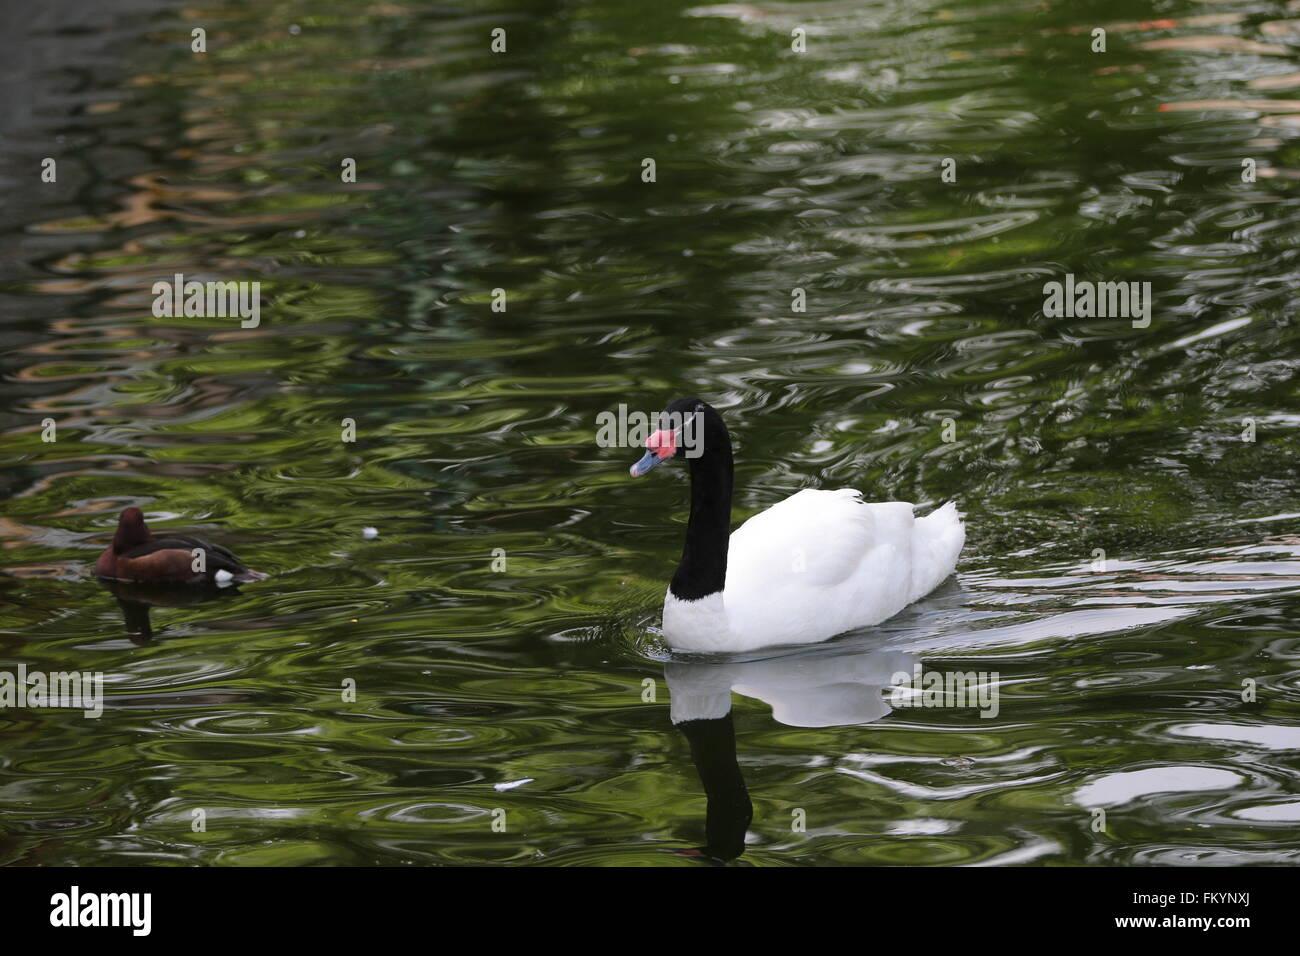 Höckerschwan (Cygnus Olor) auf dem Wasser Stockbild